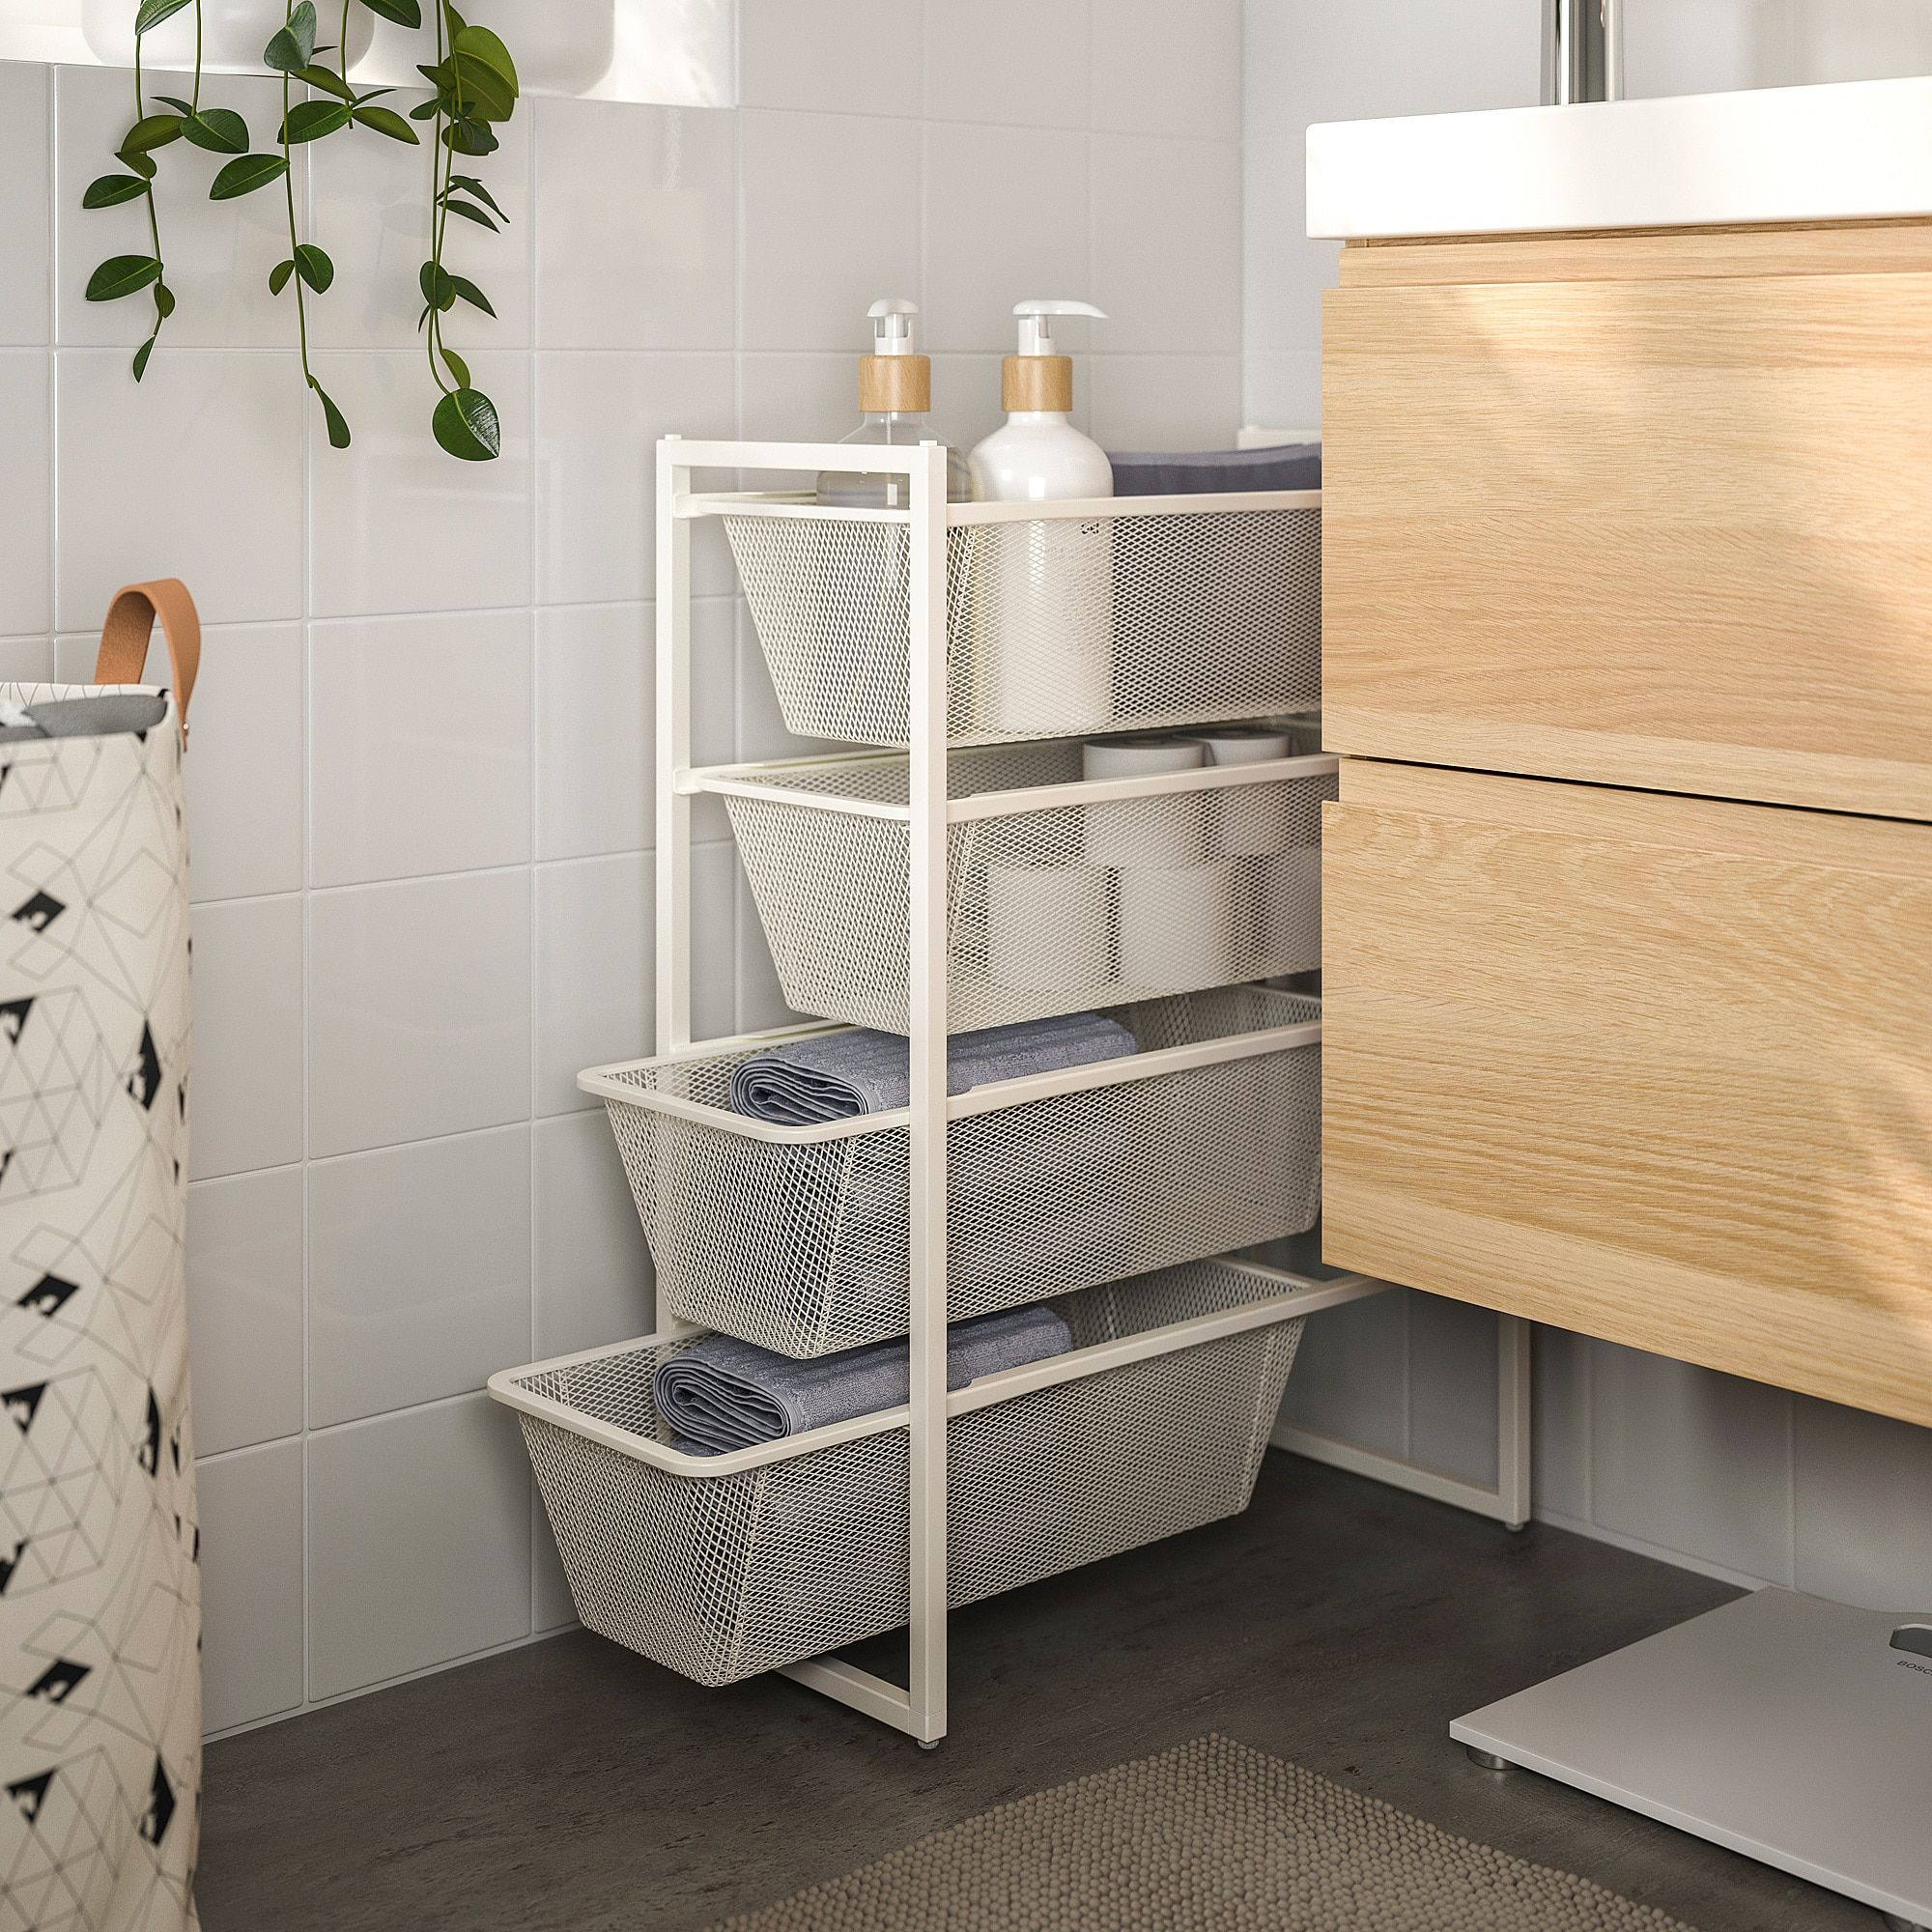 Jonaxel Frame With Mesh Baskets 25x51x70 Cm Bathroom Renovation